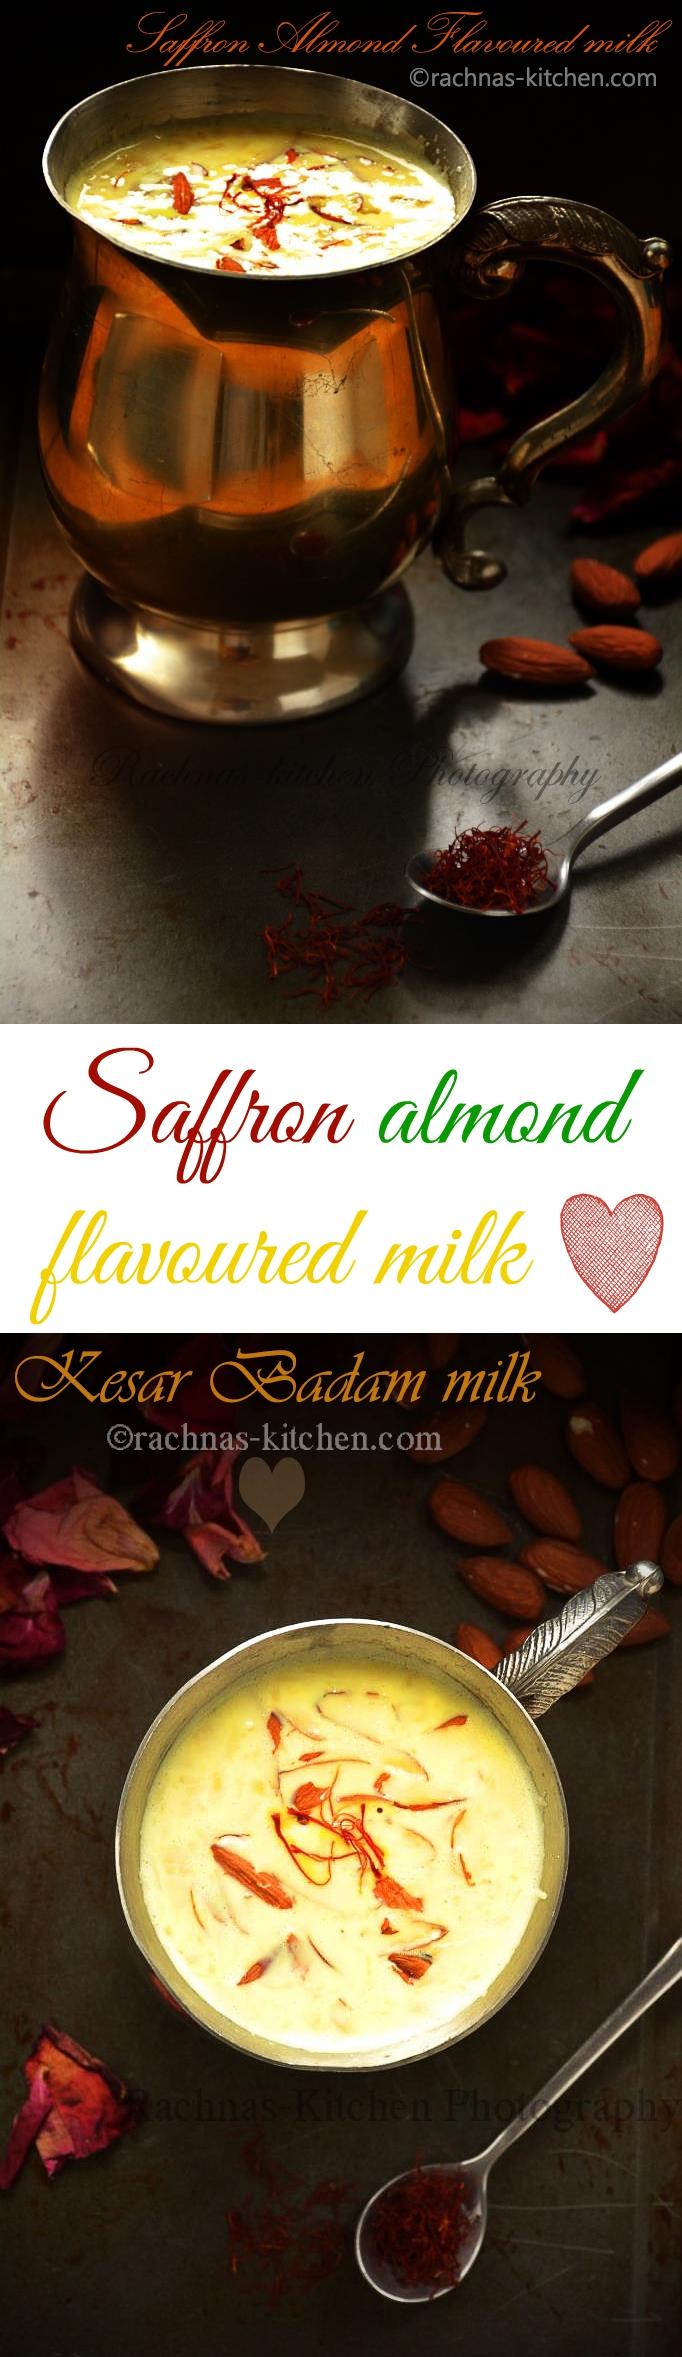 almond saffron milk recipe